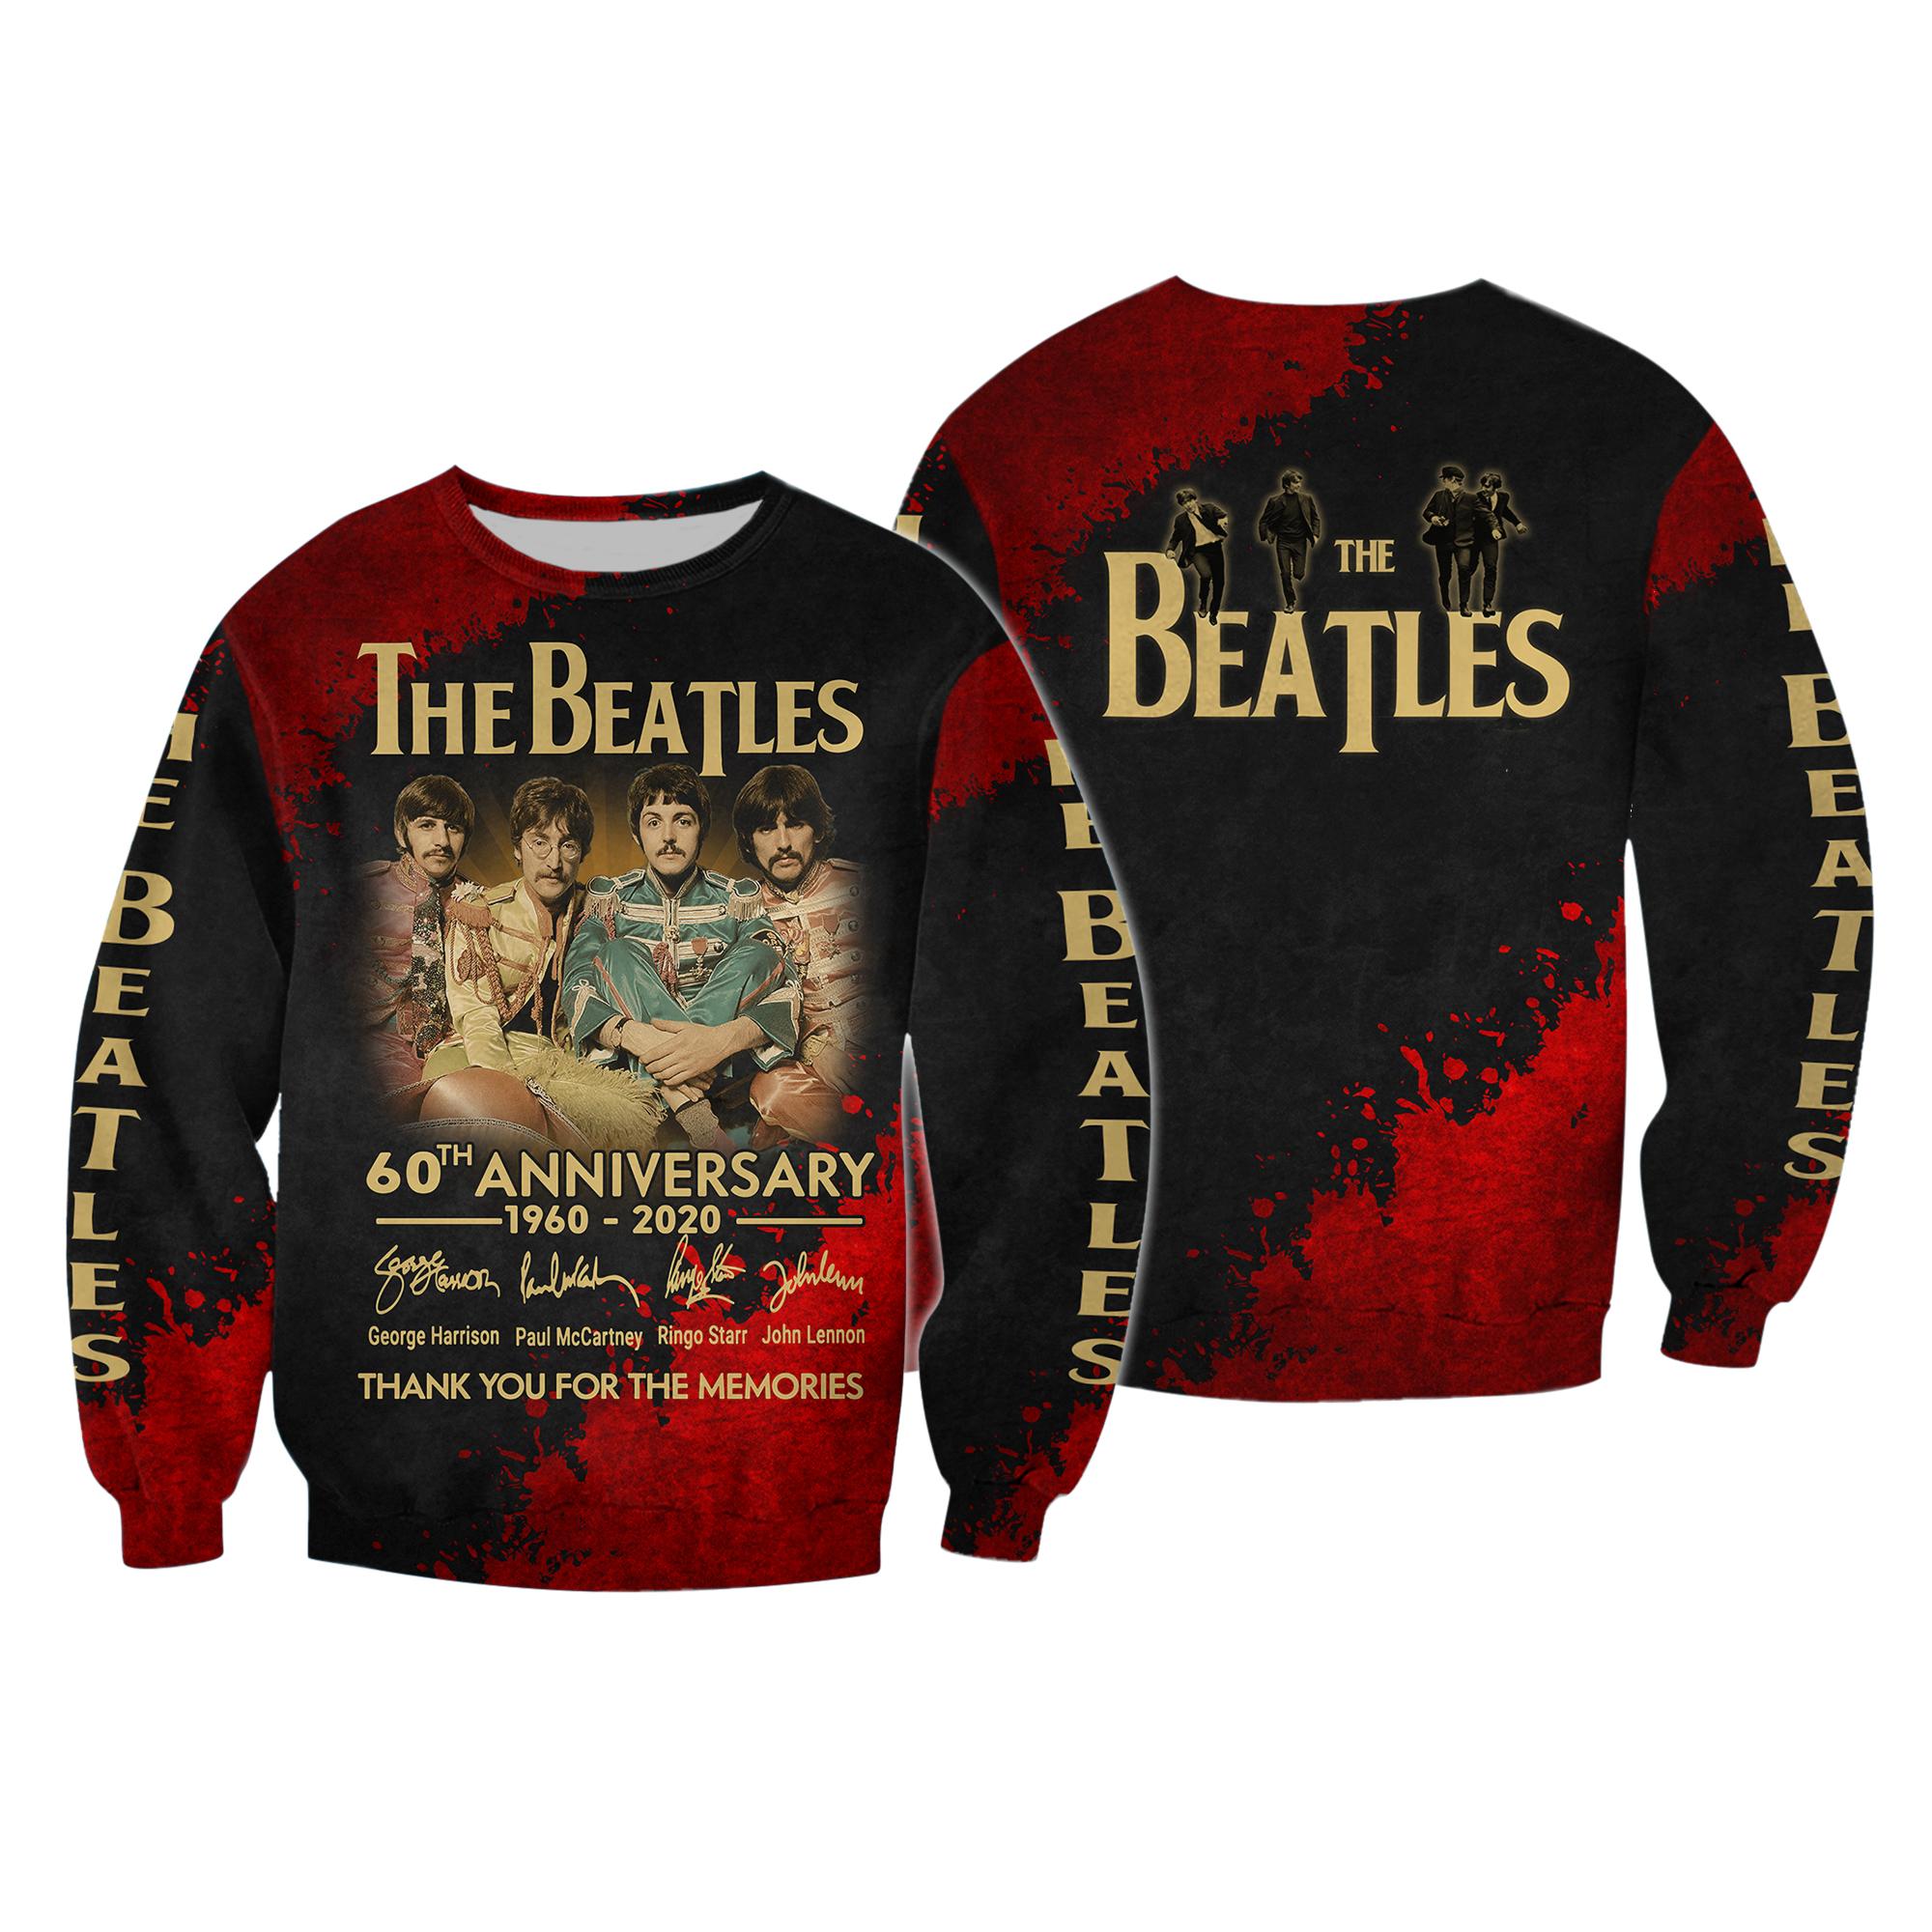 The beatles 60th anniversary 1960-2020 full printing sweatshirt